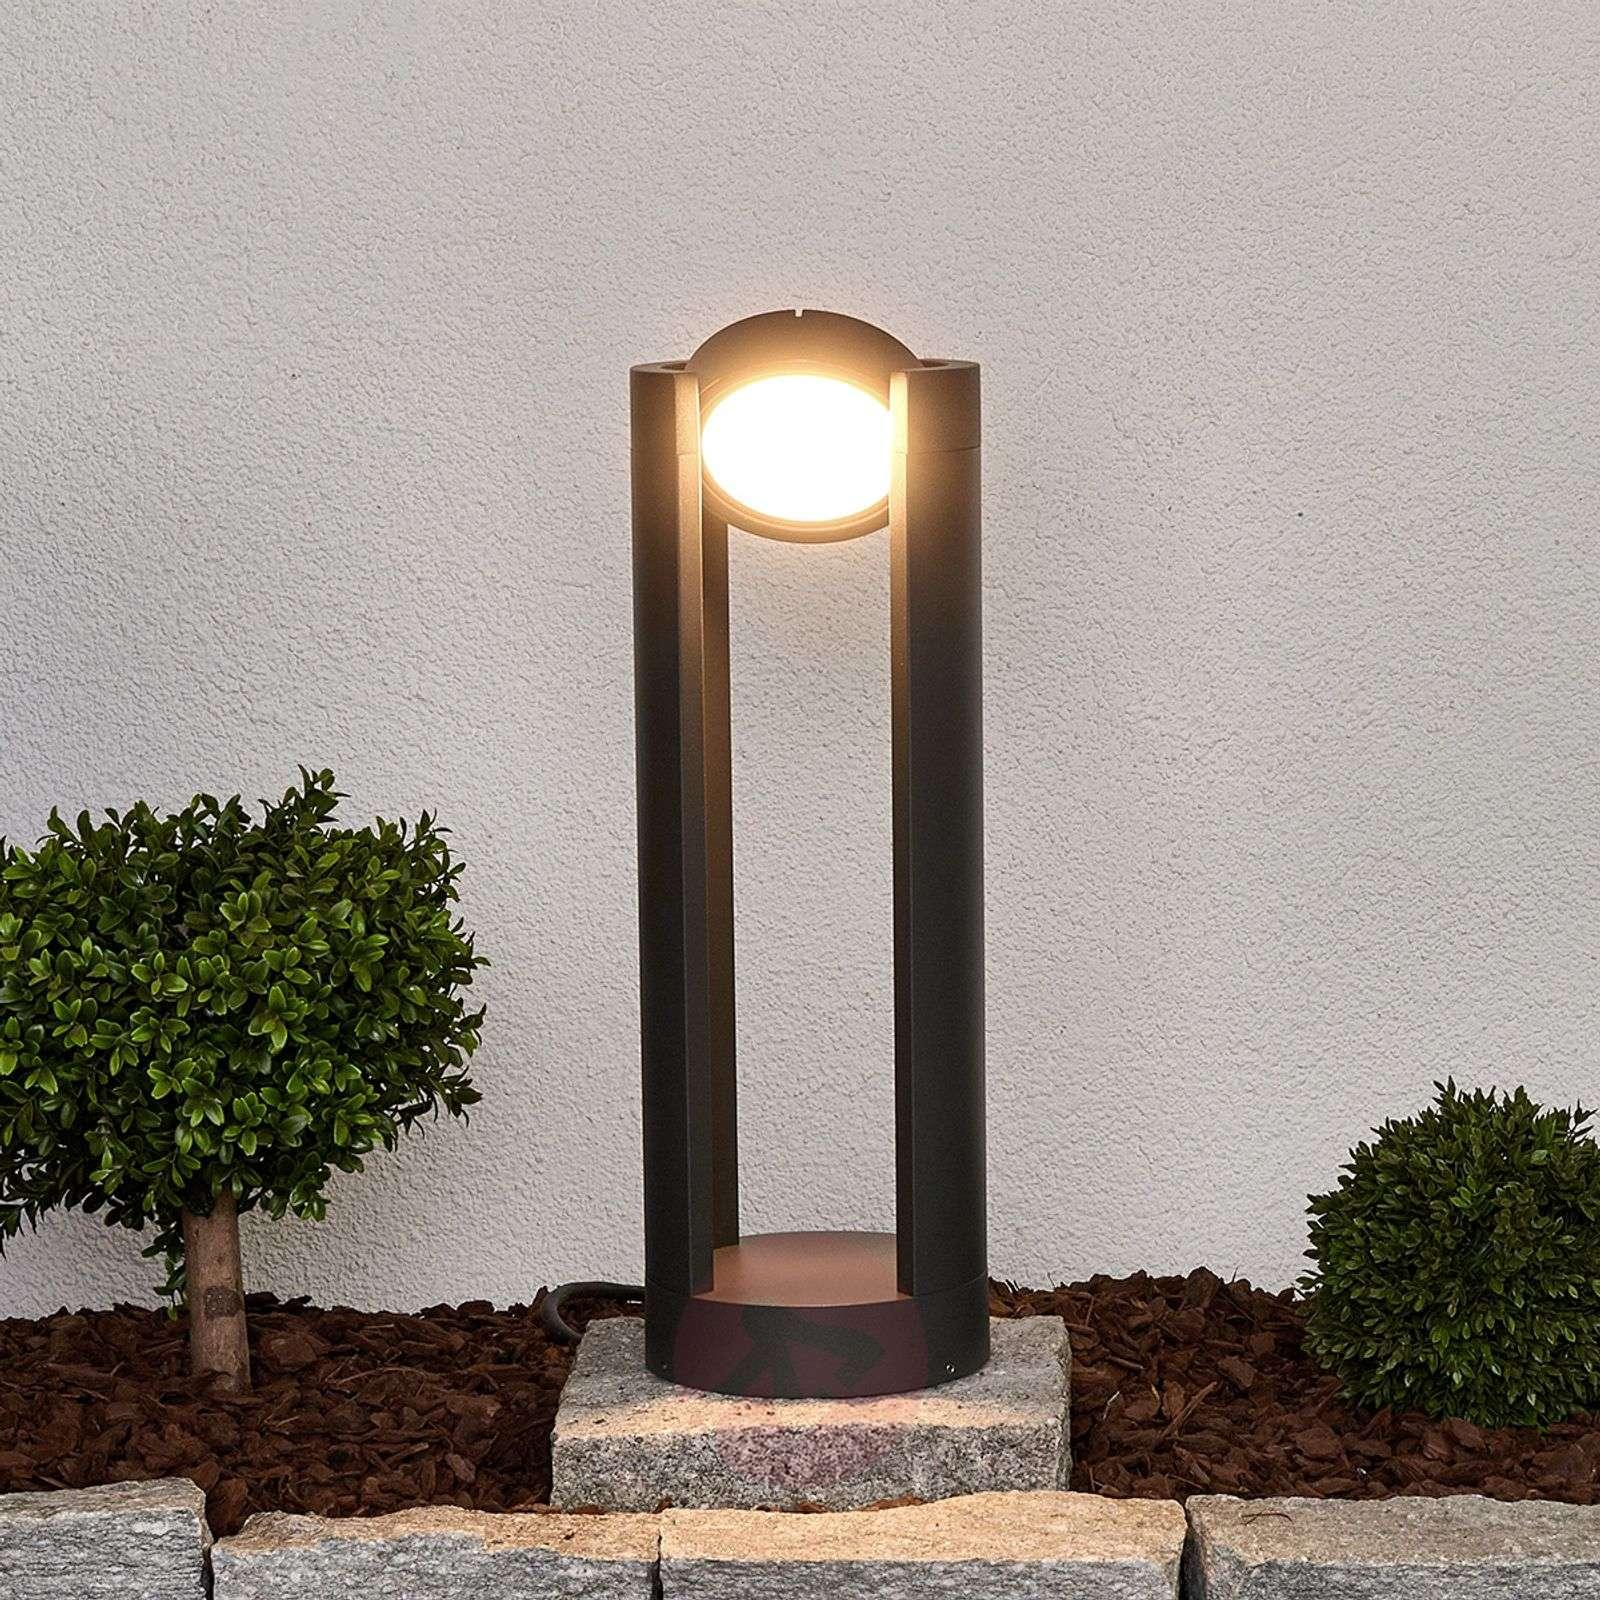 Adjustable LED pillar light Dylen-9616085-01